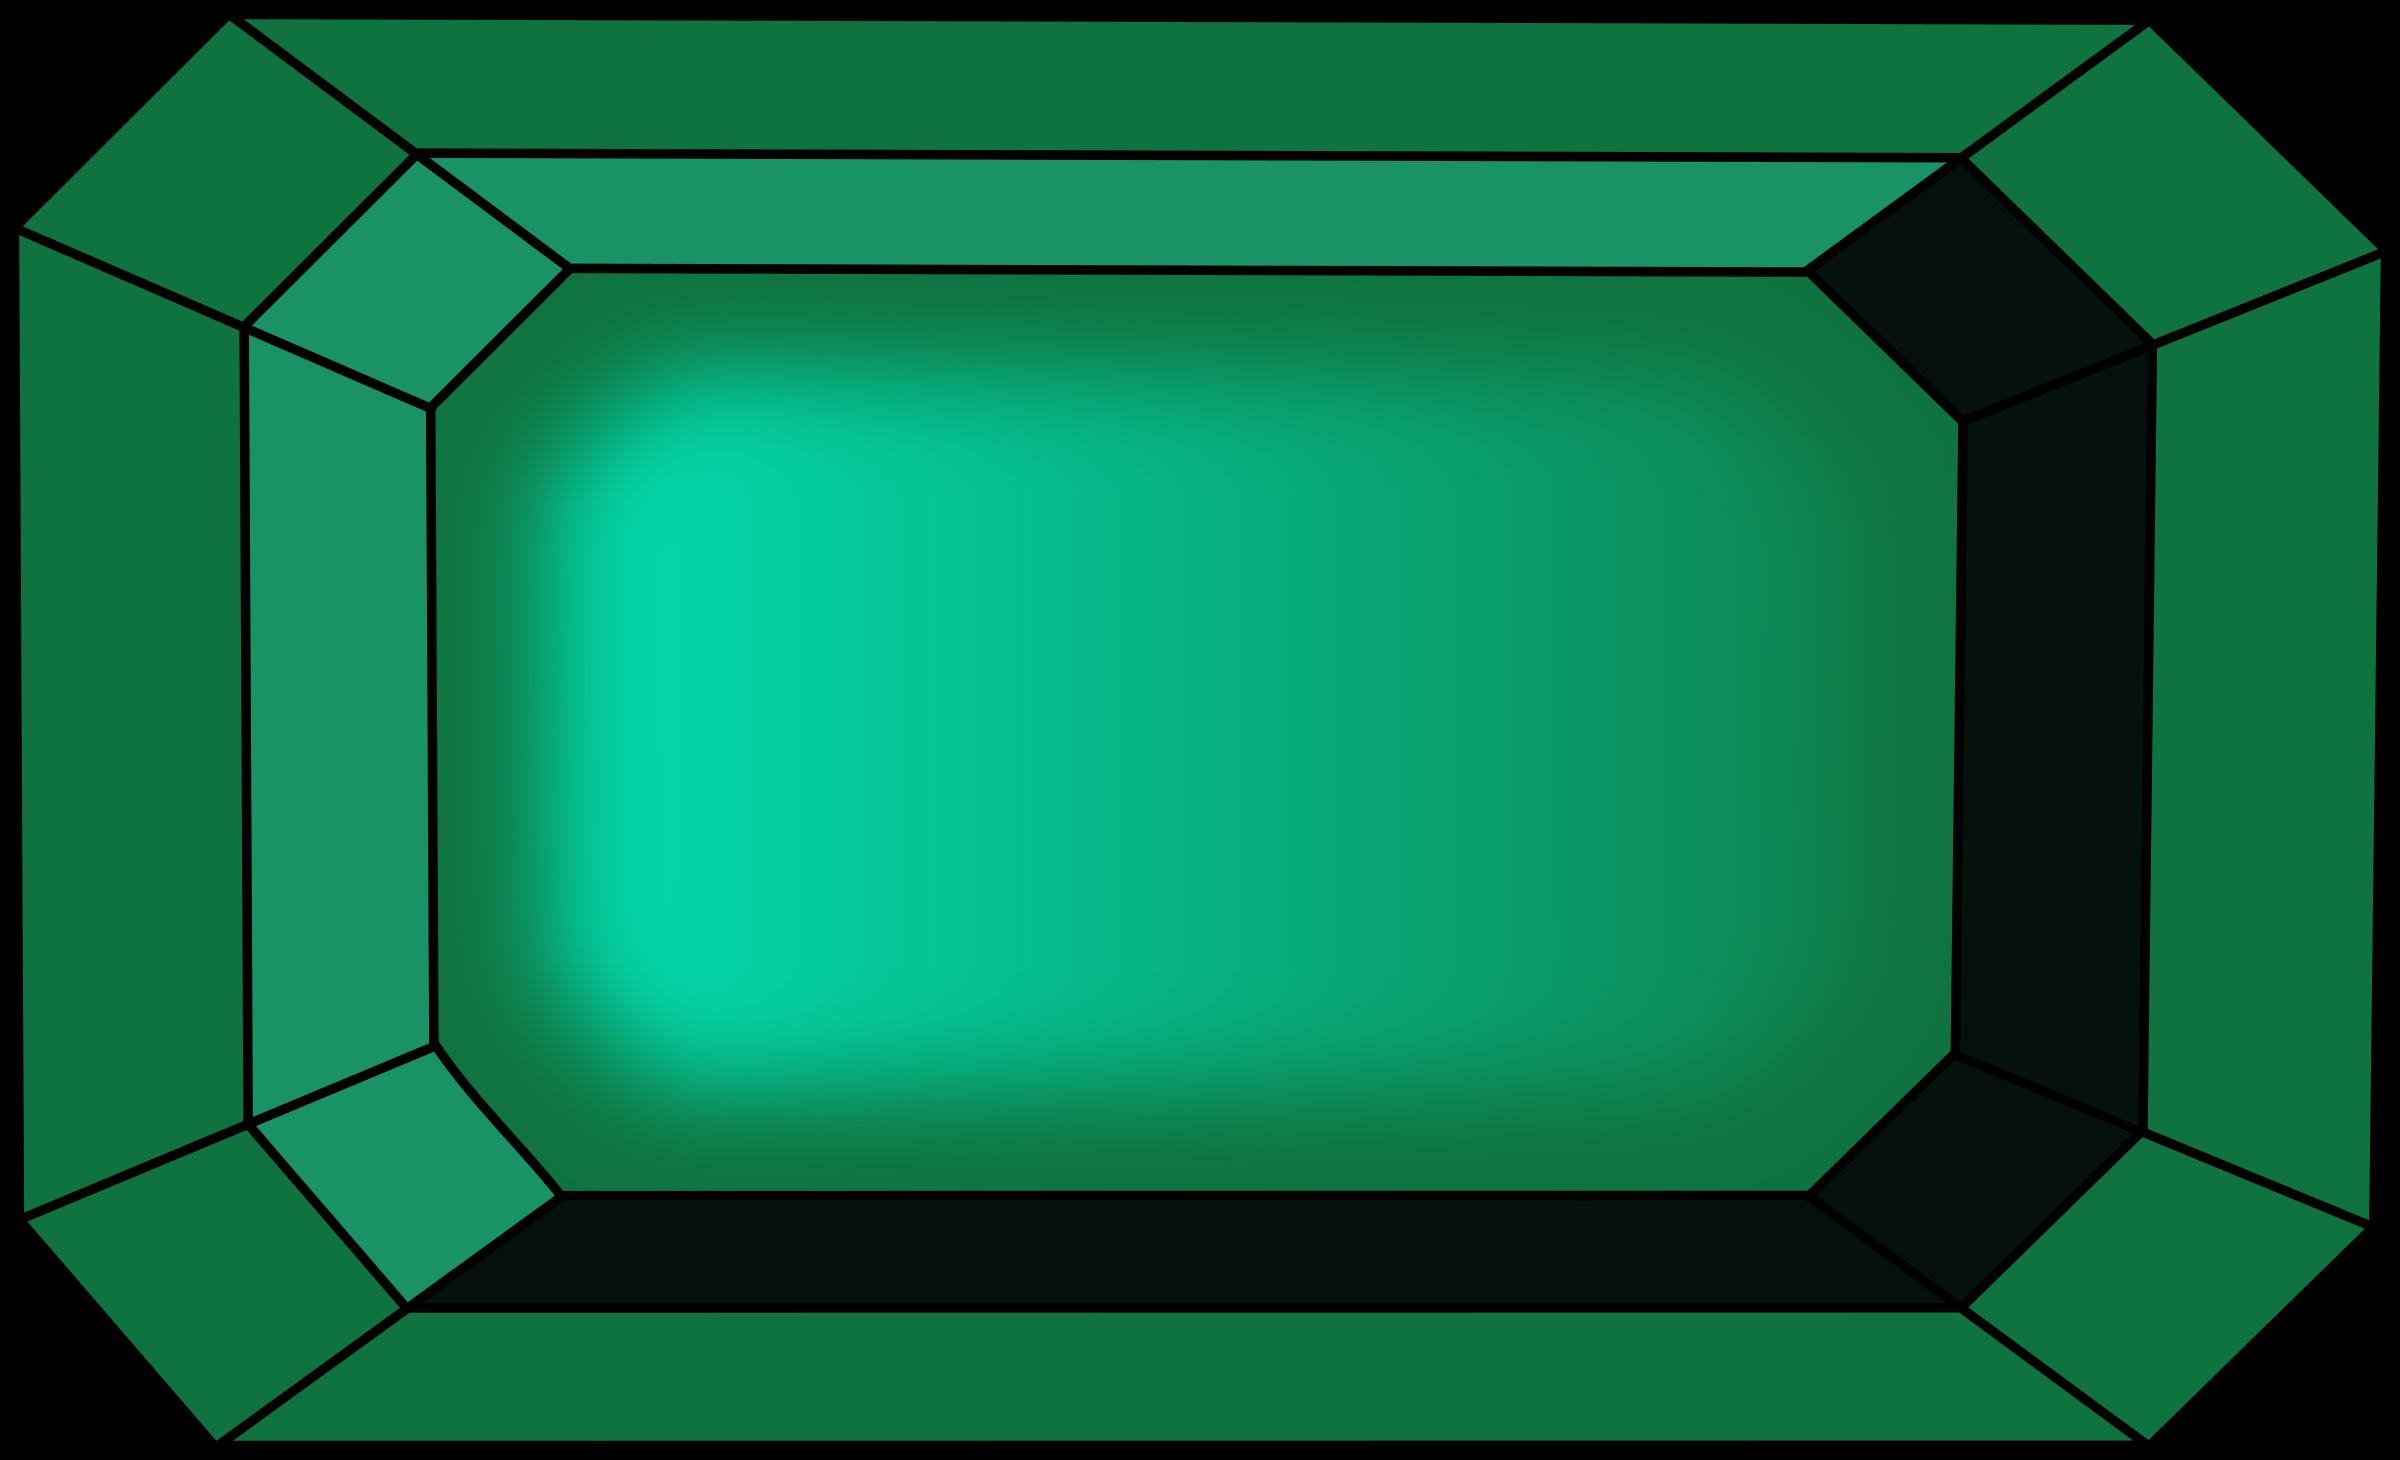 Emerald clipart Emerald Clipart Emerald